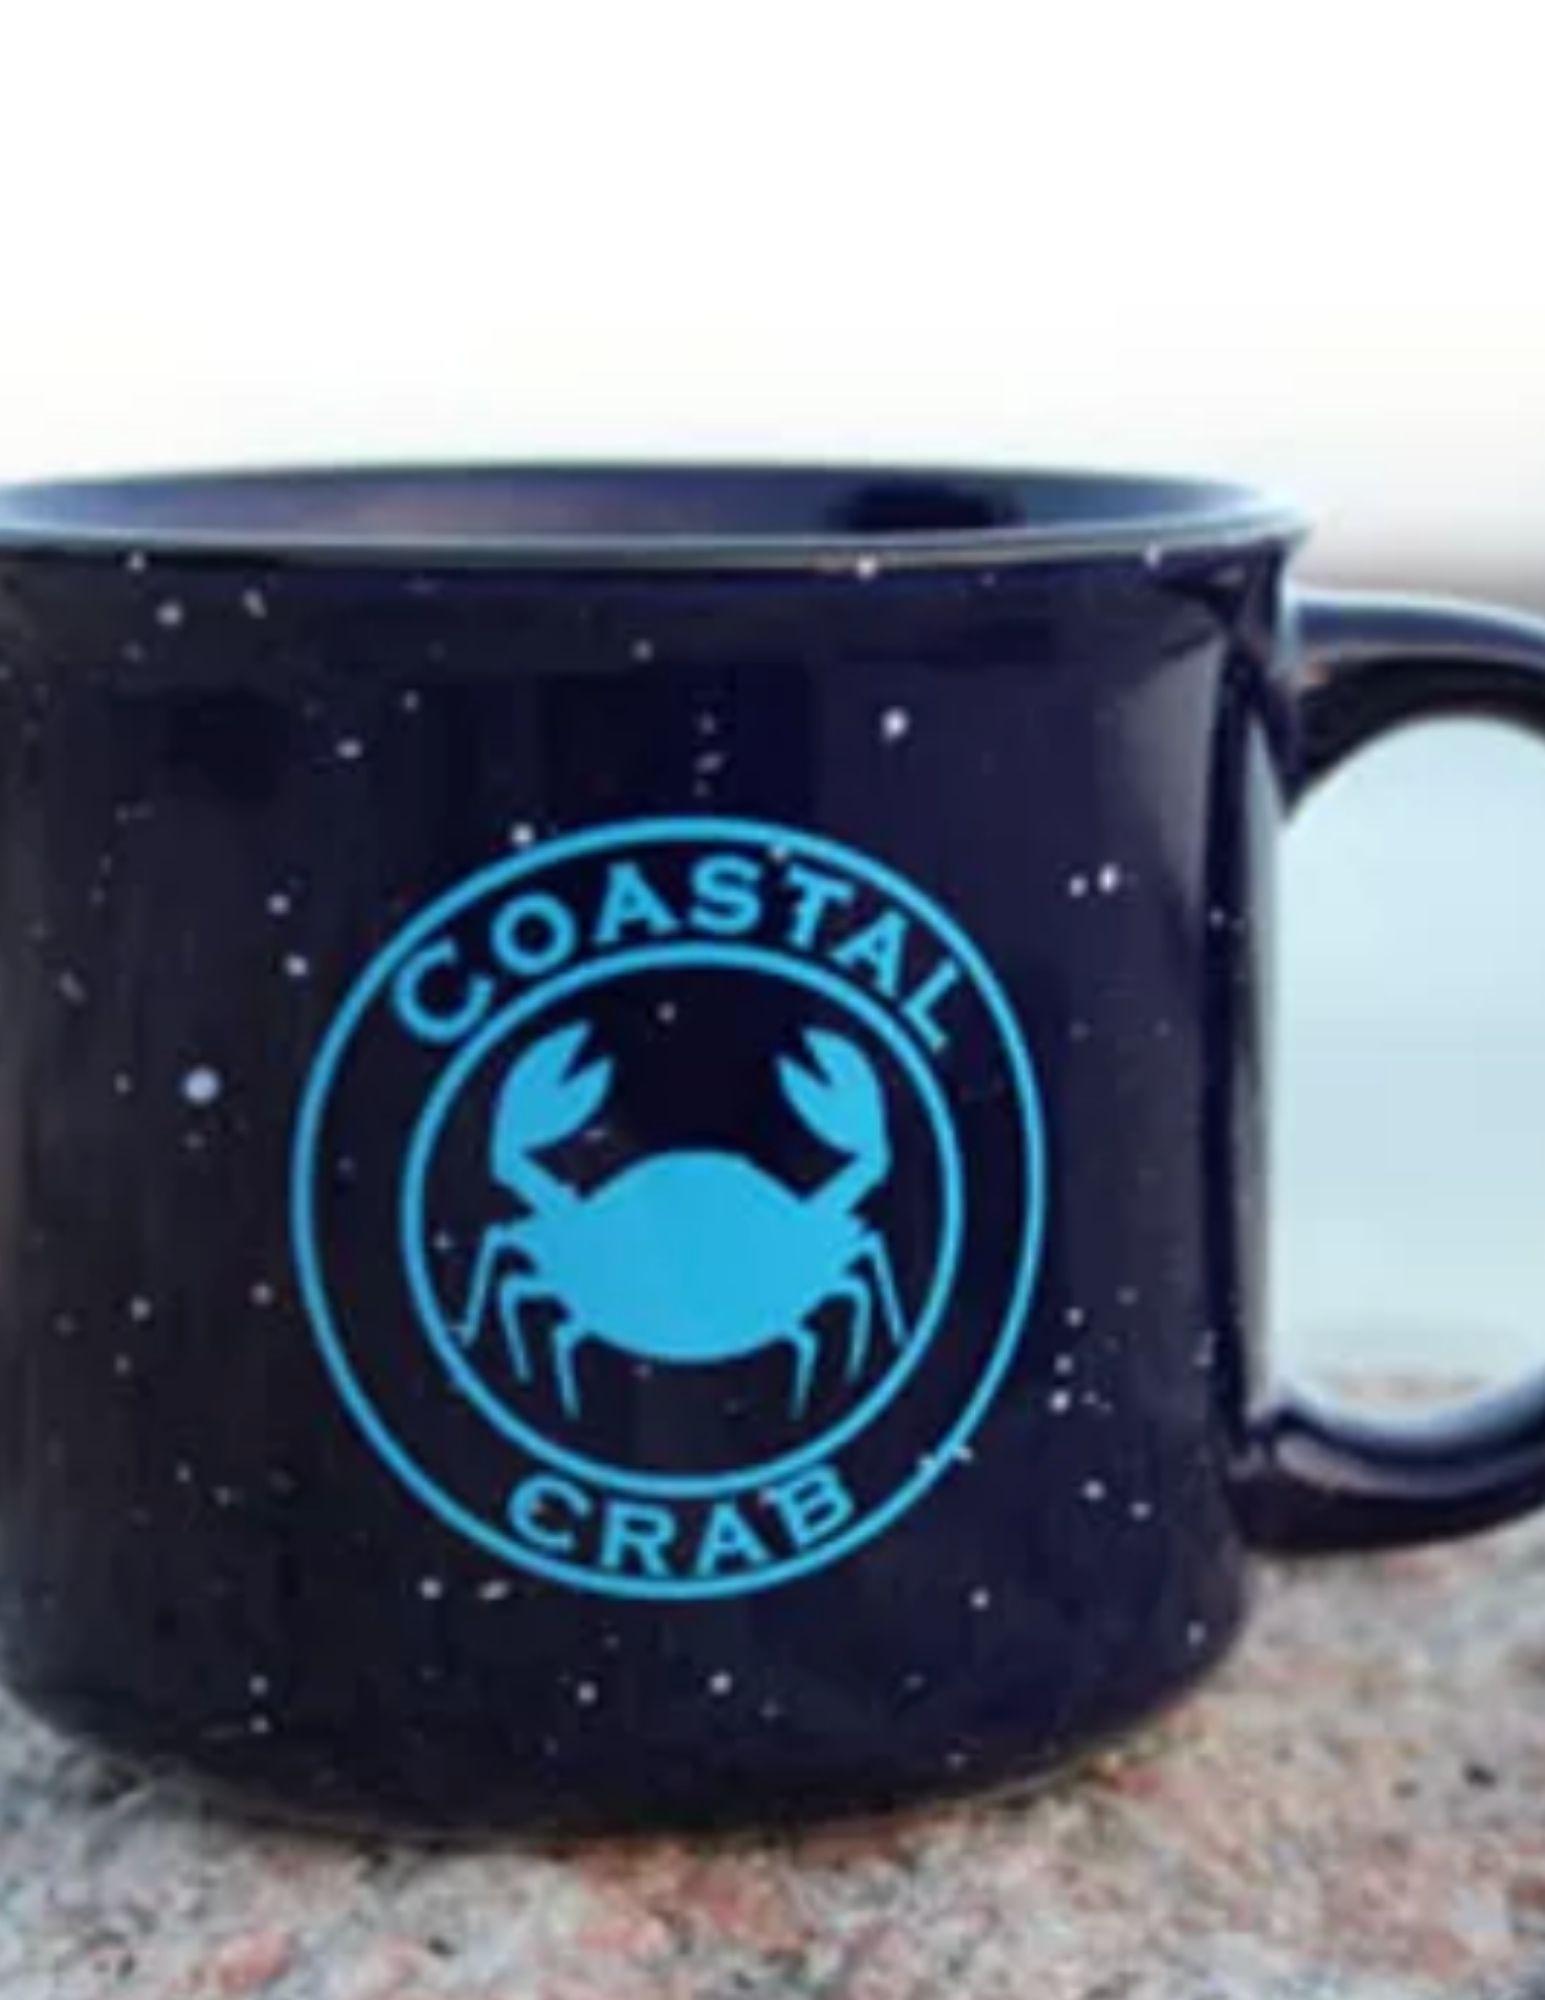 Coastal Crab CT Coastal Gifts on Main Niantic-15